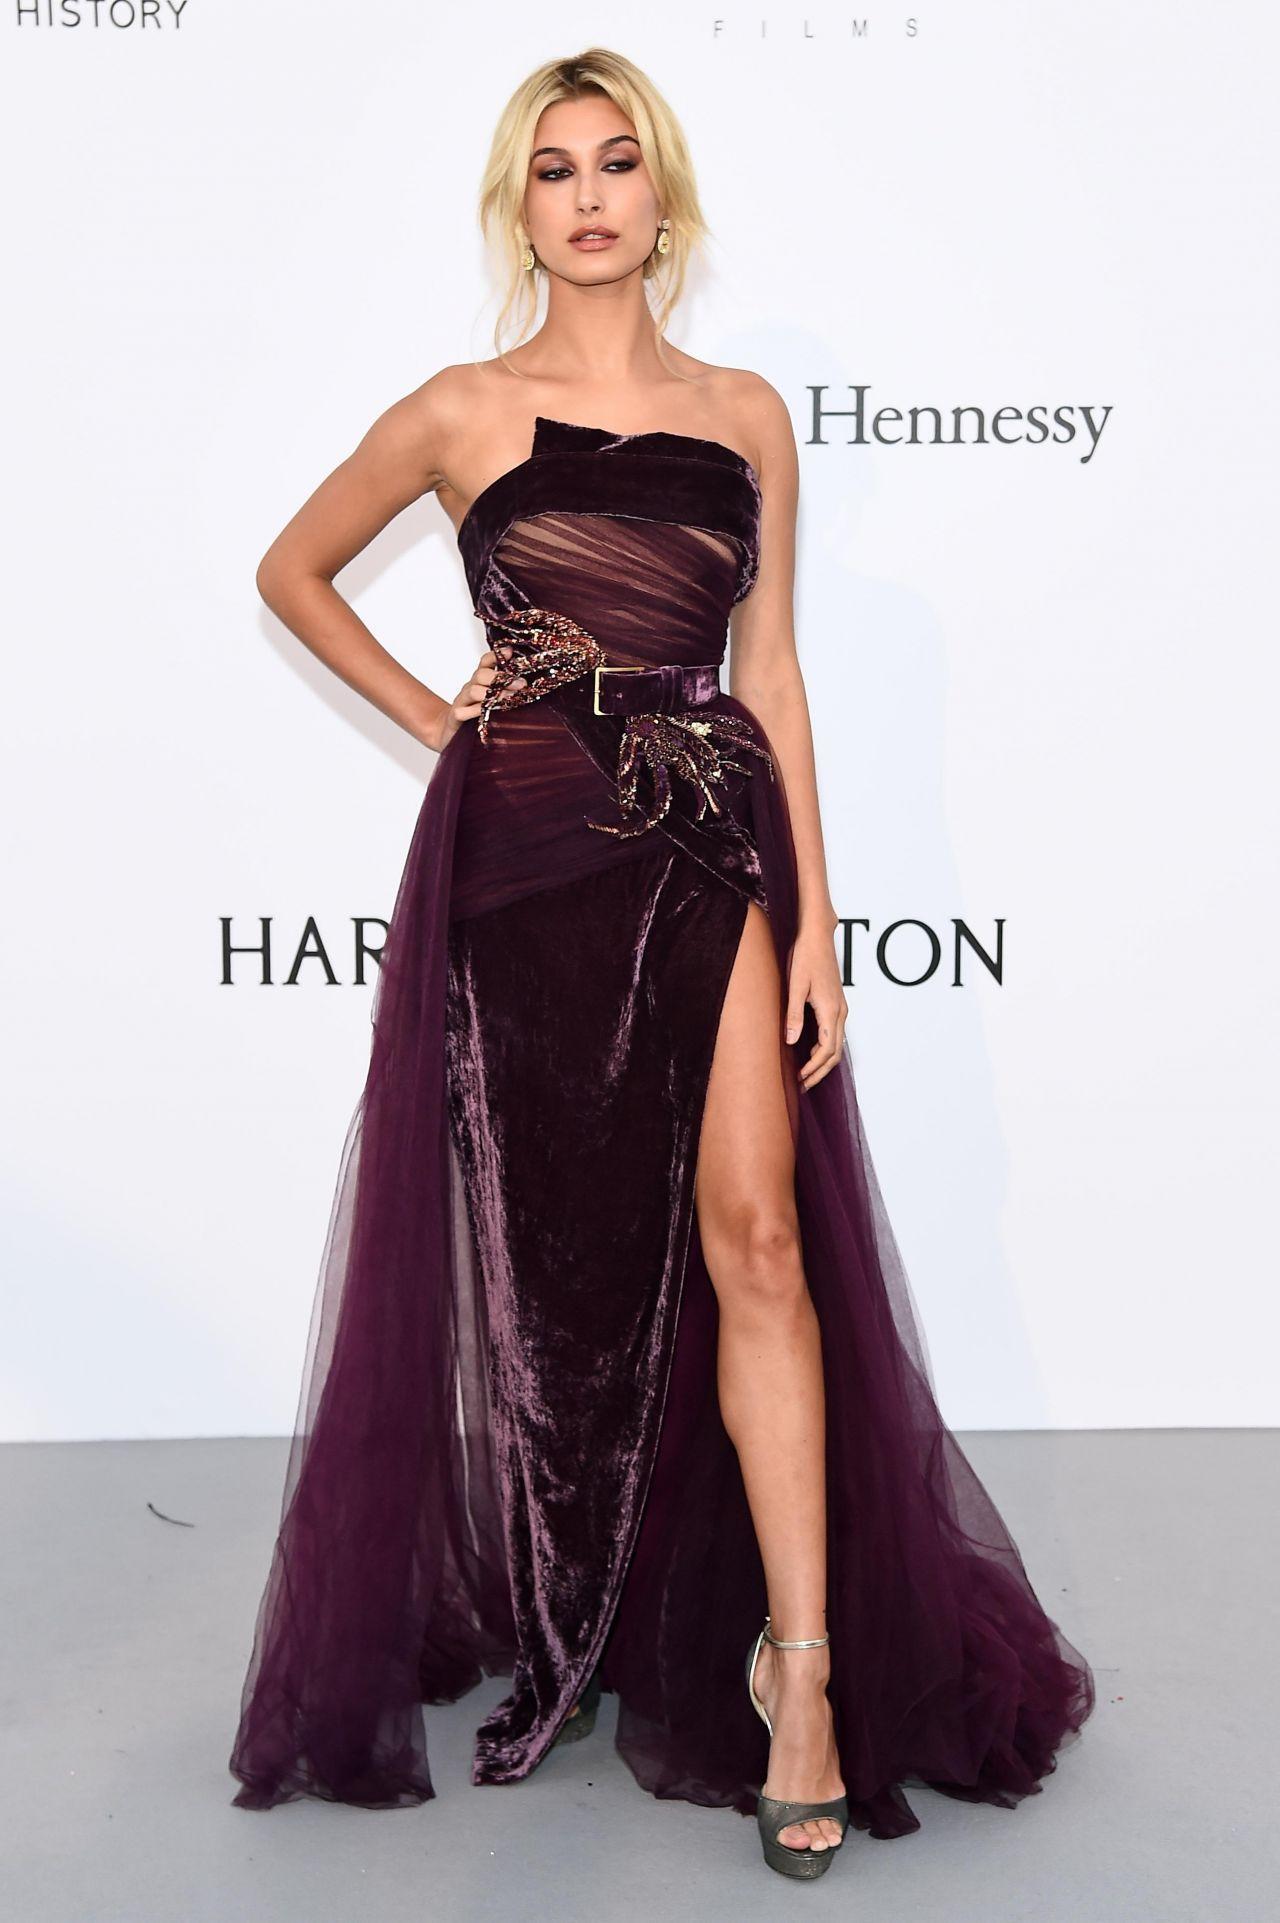 Red carpet style models like bella hadid and hailey baldwin